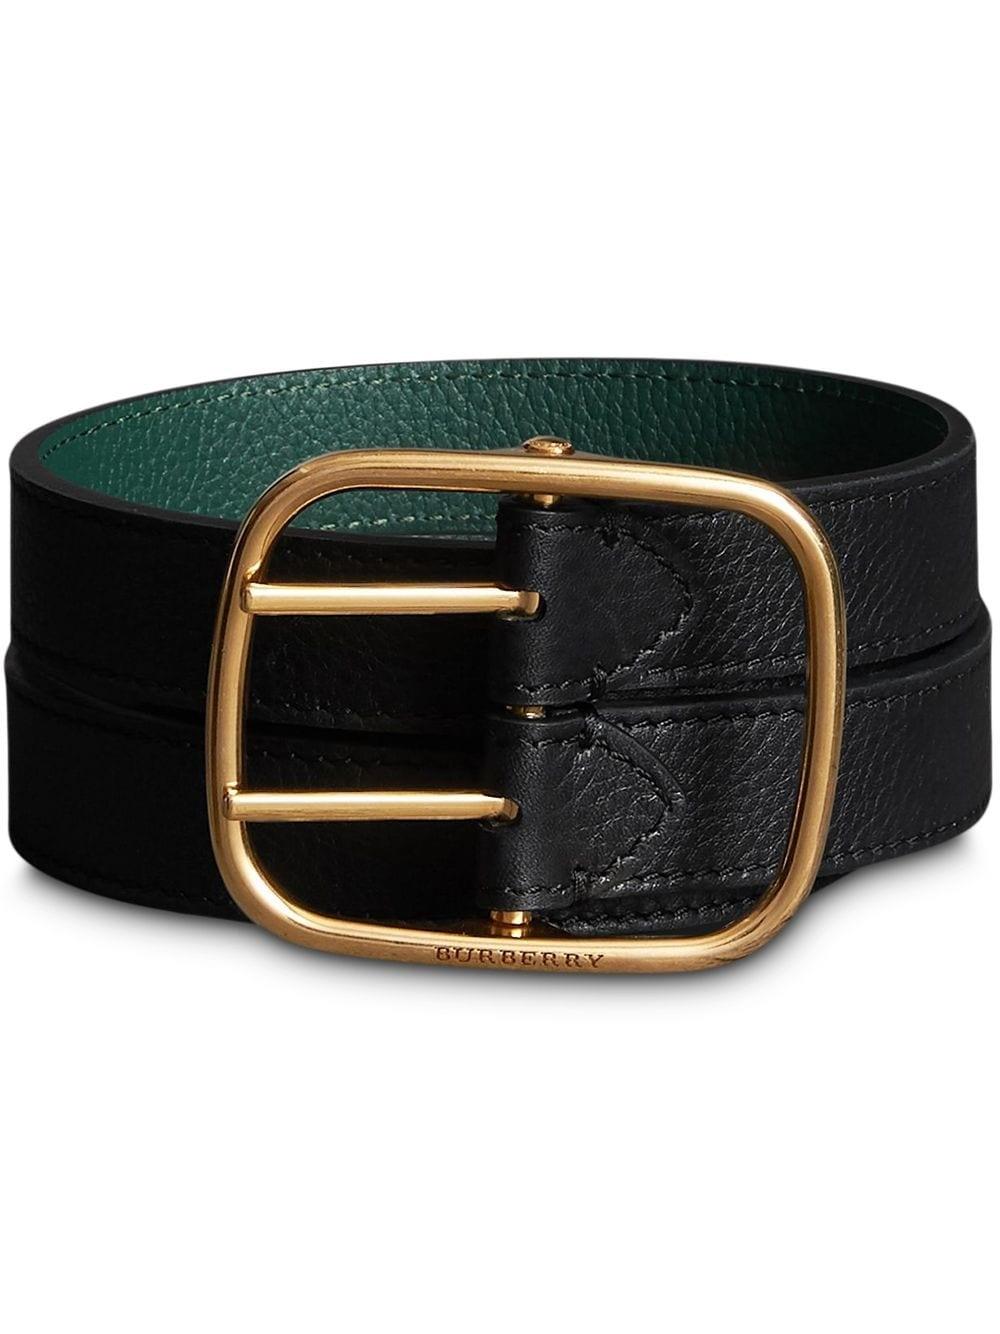 Burberry Ladies Lynton Dual Pronged Leather Belt In Black,green